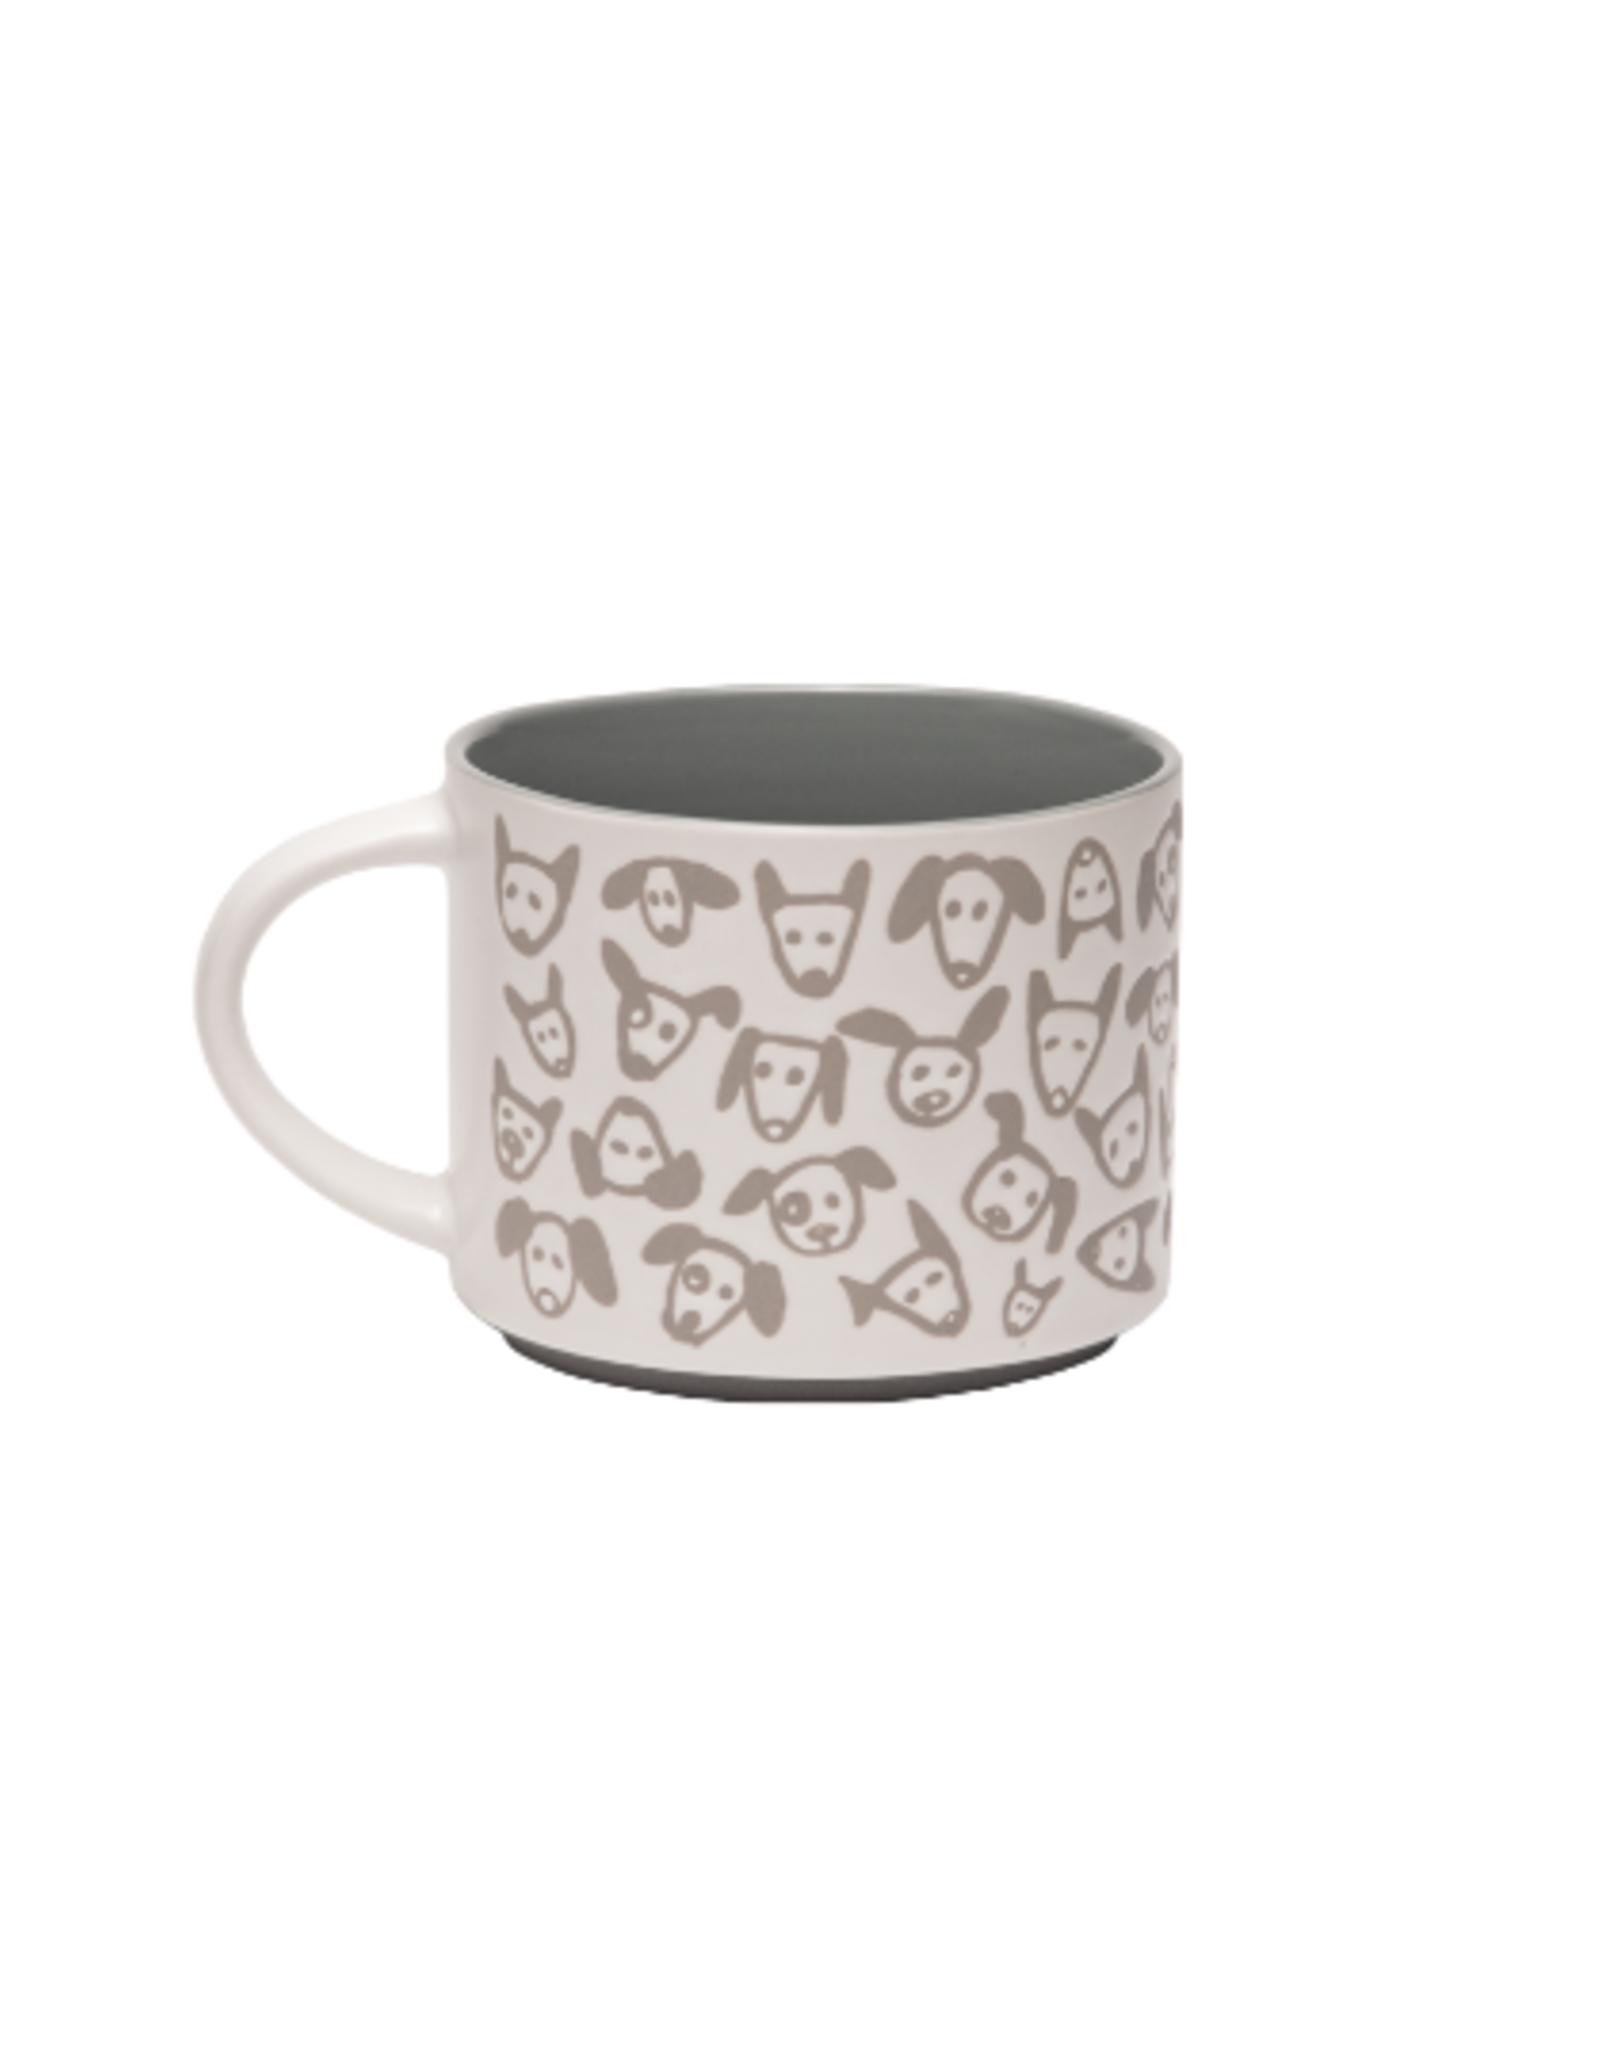 ORE Originals Pop of Color Mug, Doodle Dog